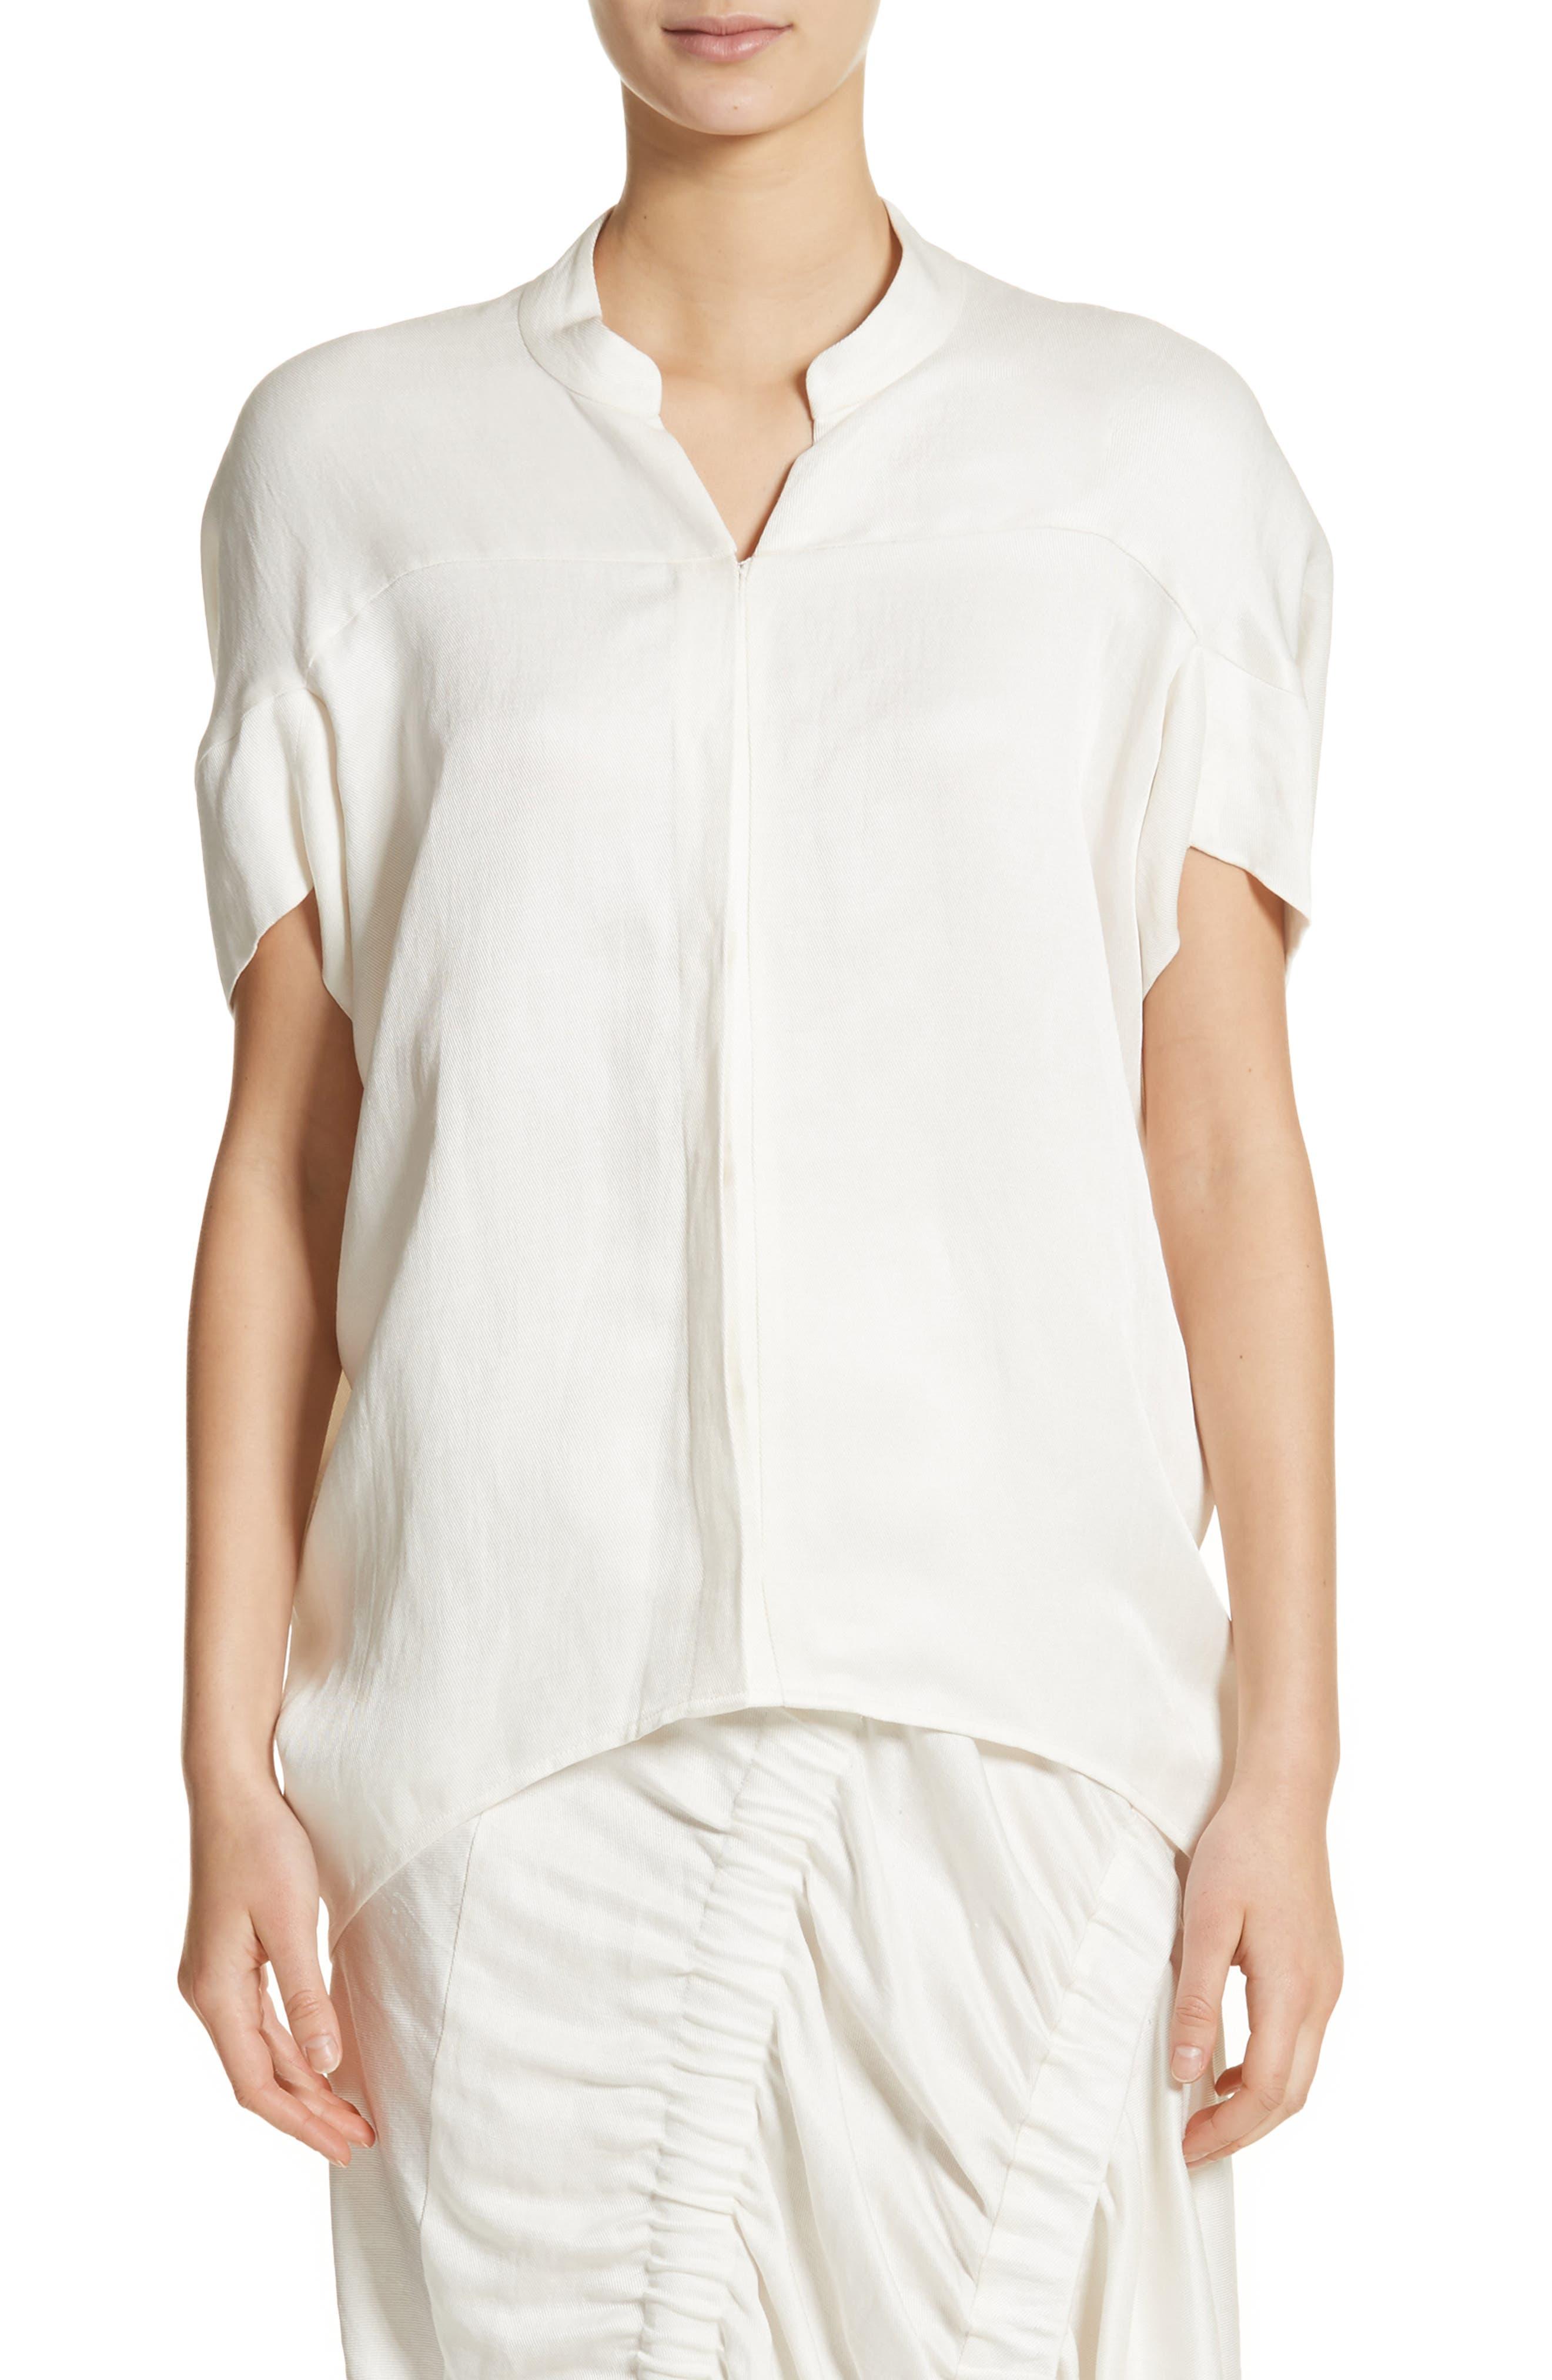 Alternate Image 1 Selected - Zero + Maria Cornejo Concave Drape Shirt